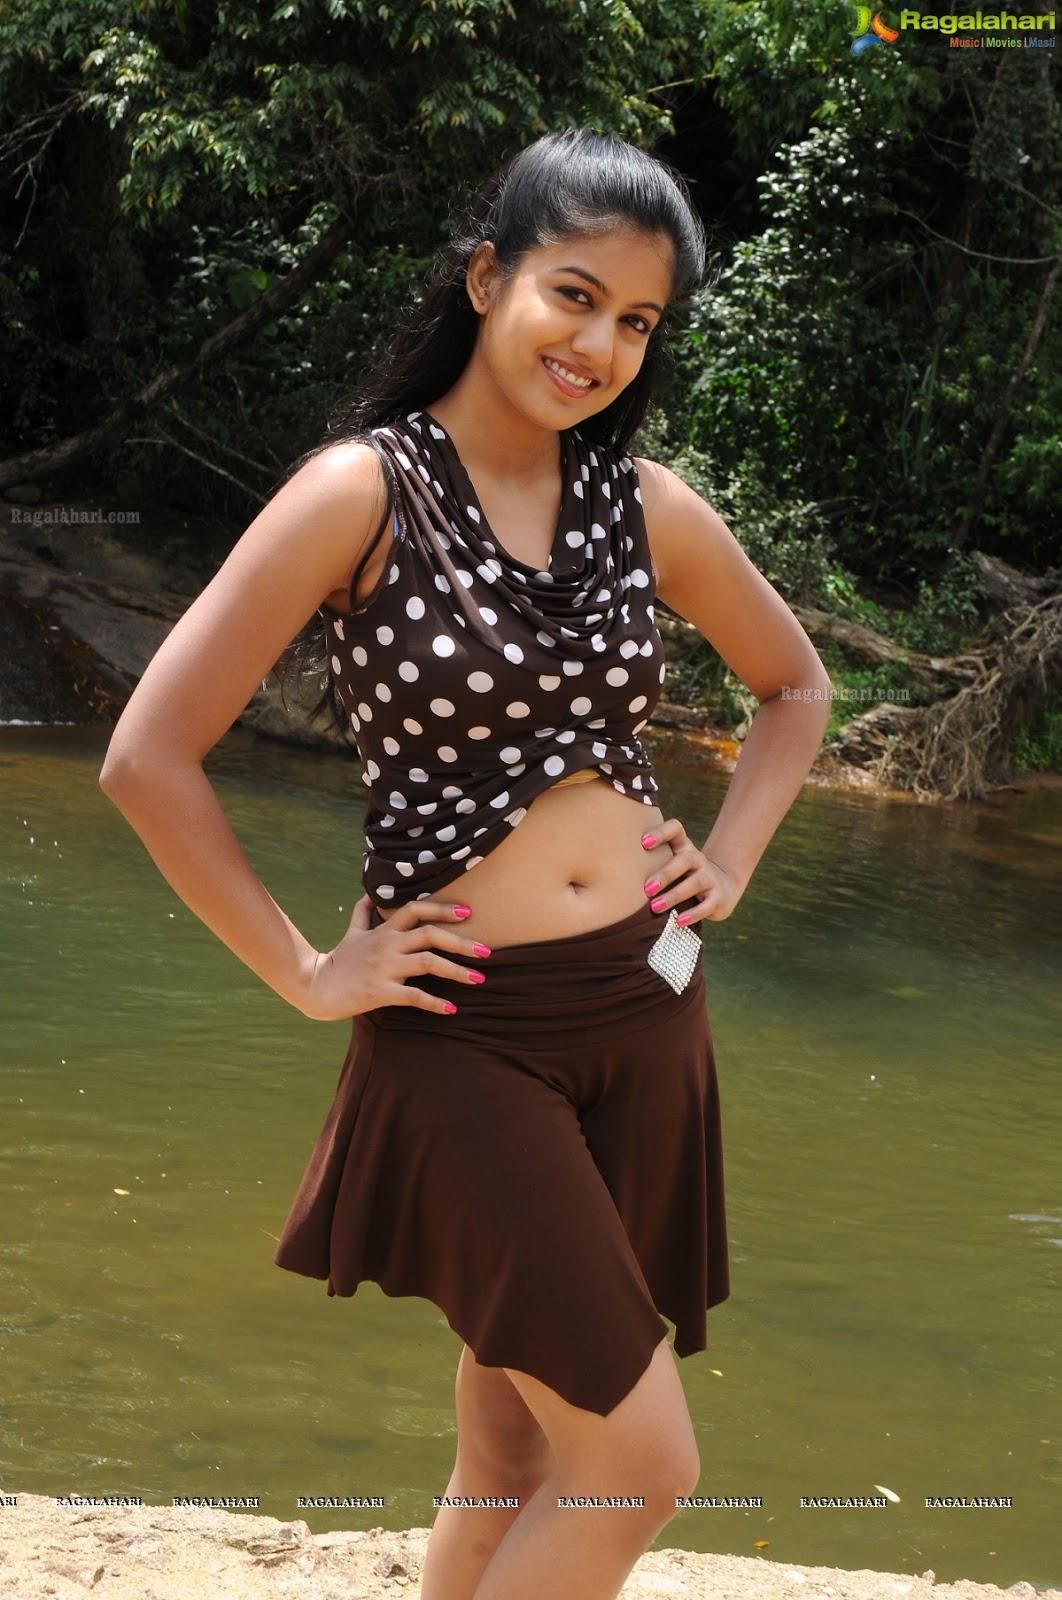 Drishyam Actress Ishita Dutta Hottest And Latest Pics -8878